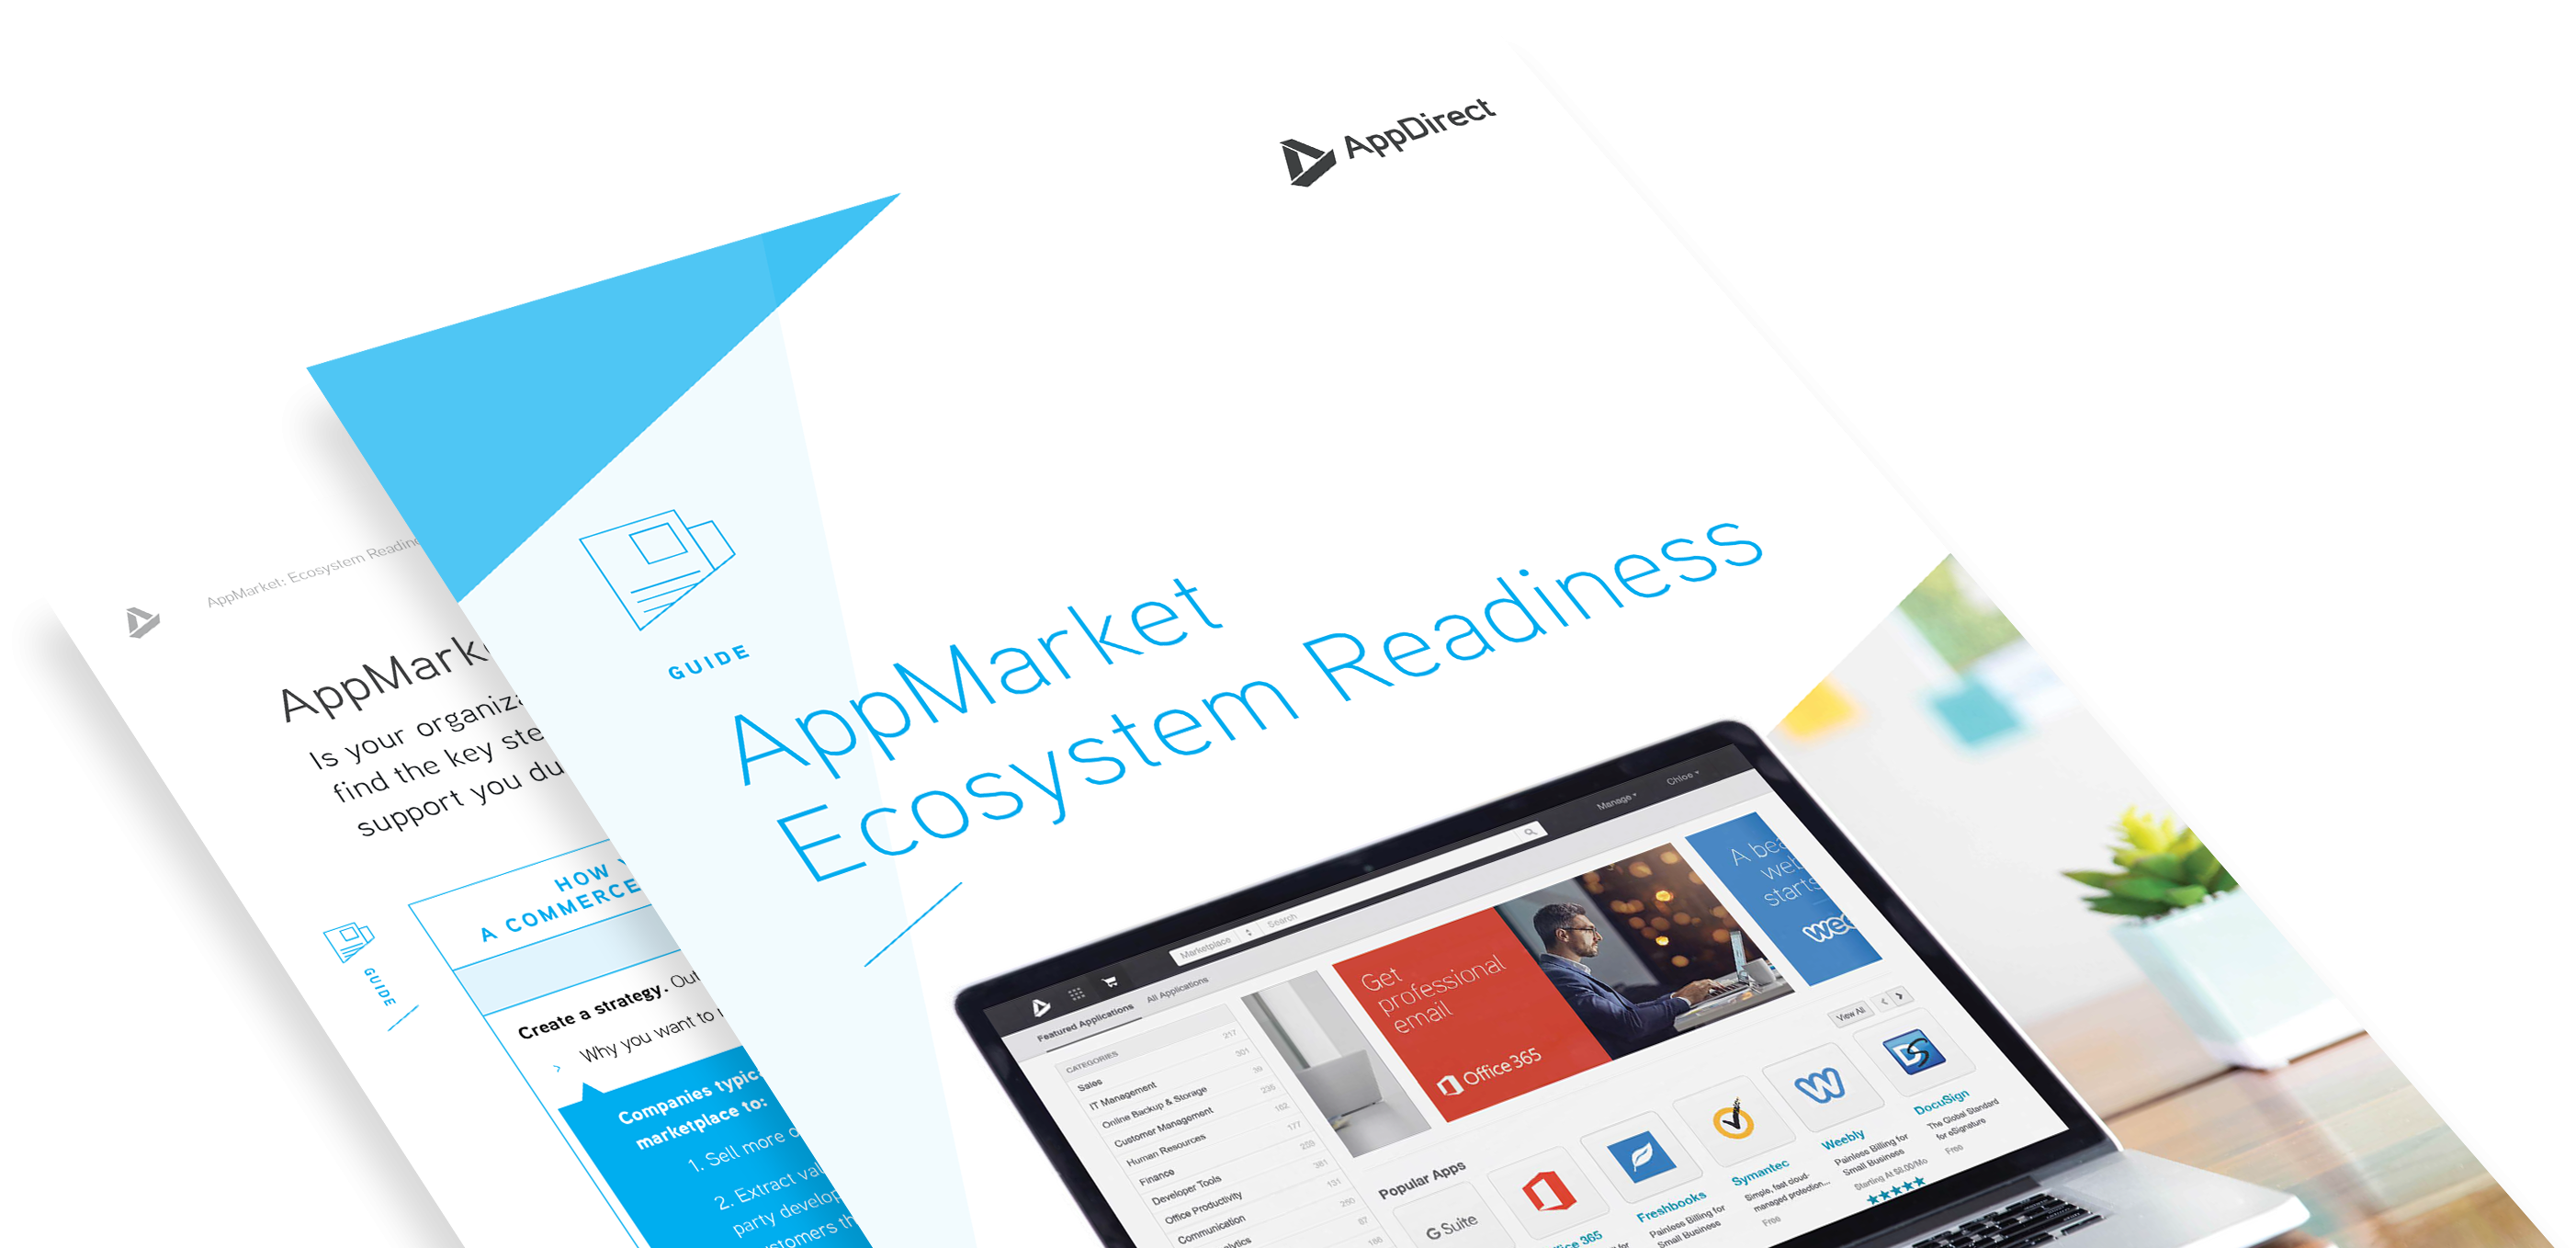 AppMarket Ecosystem Readiness